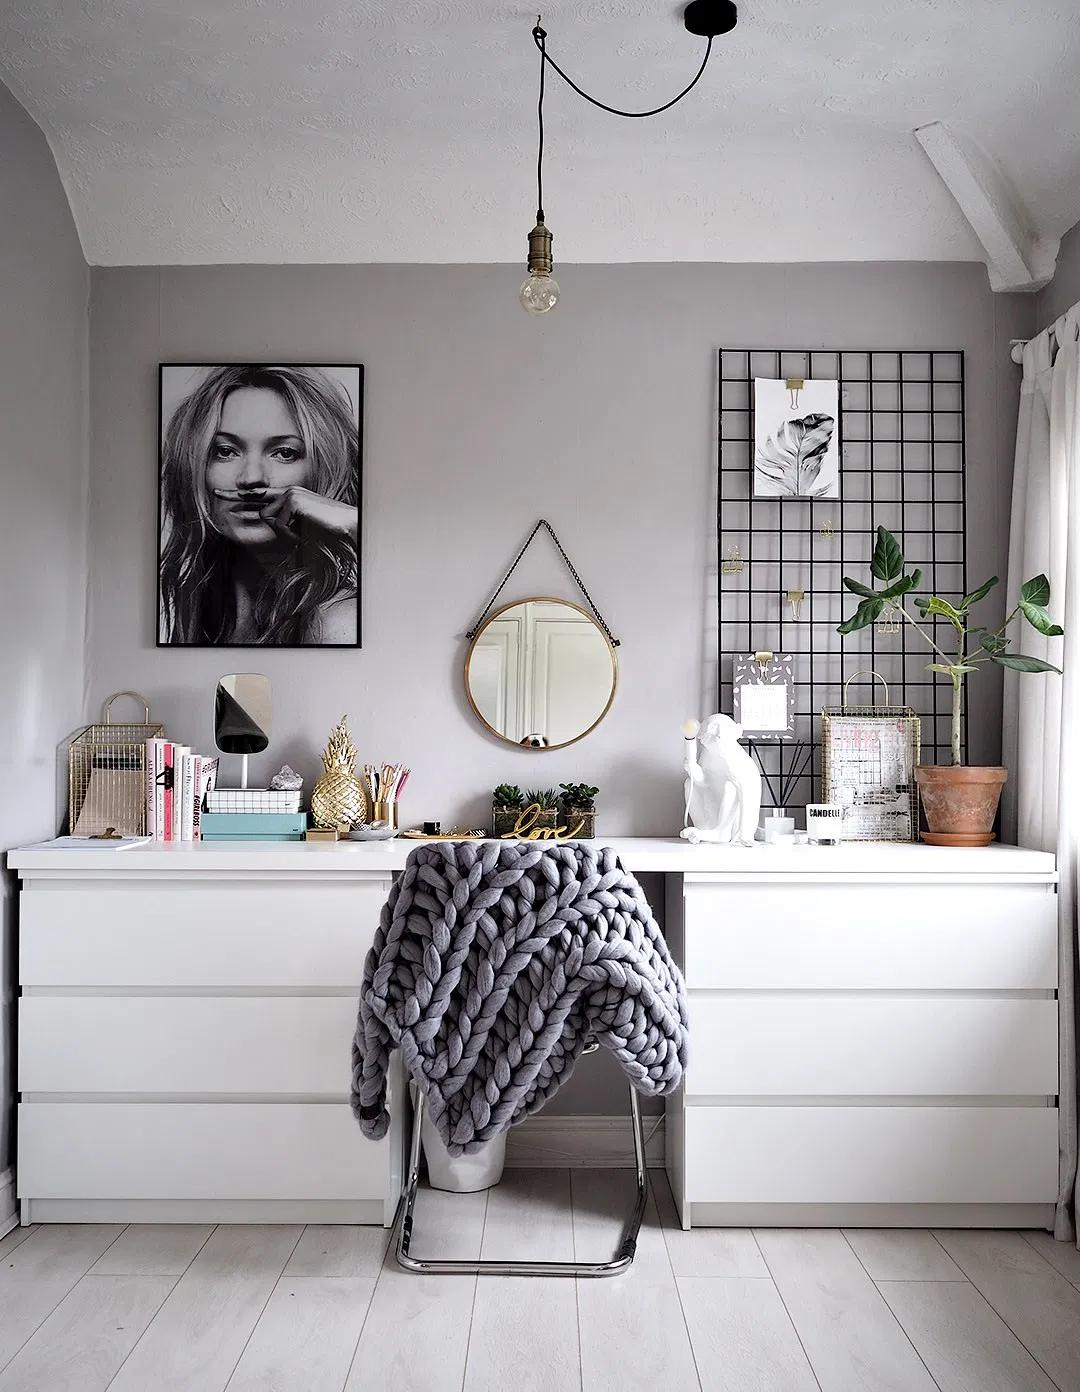 Ikea bookshelves turned into a long desk